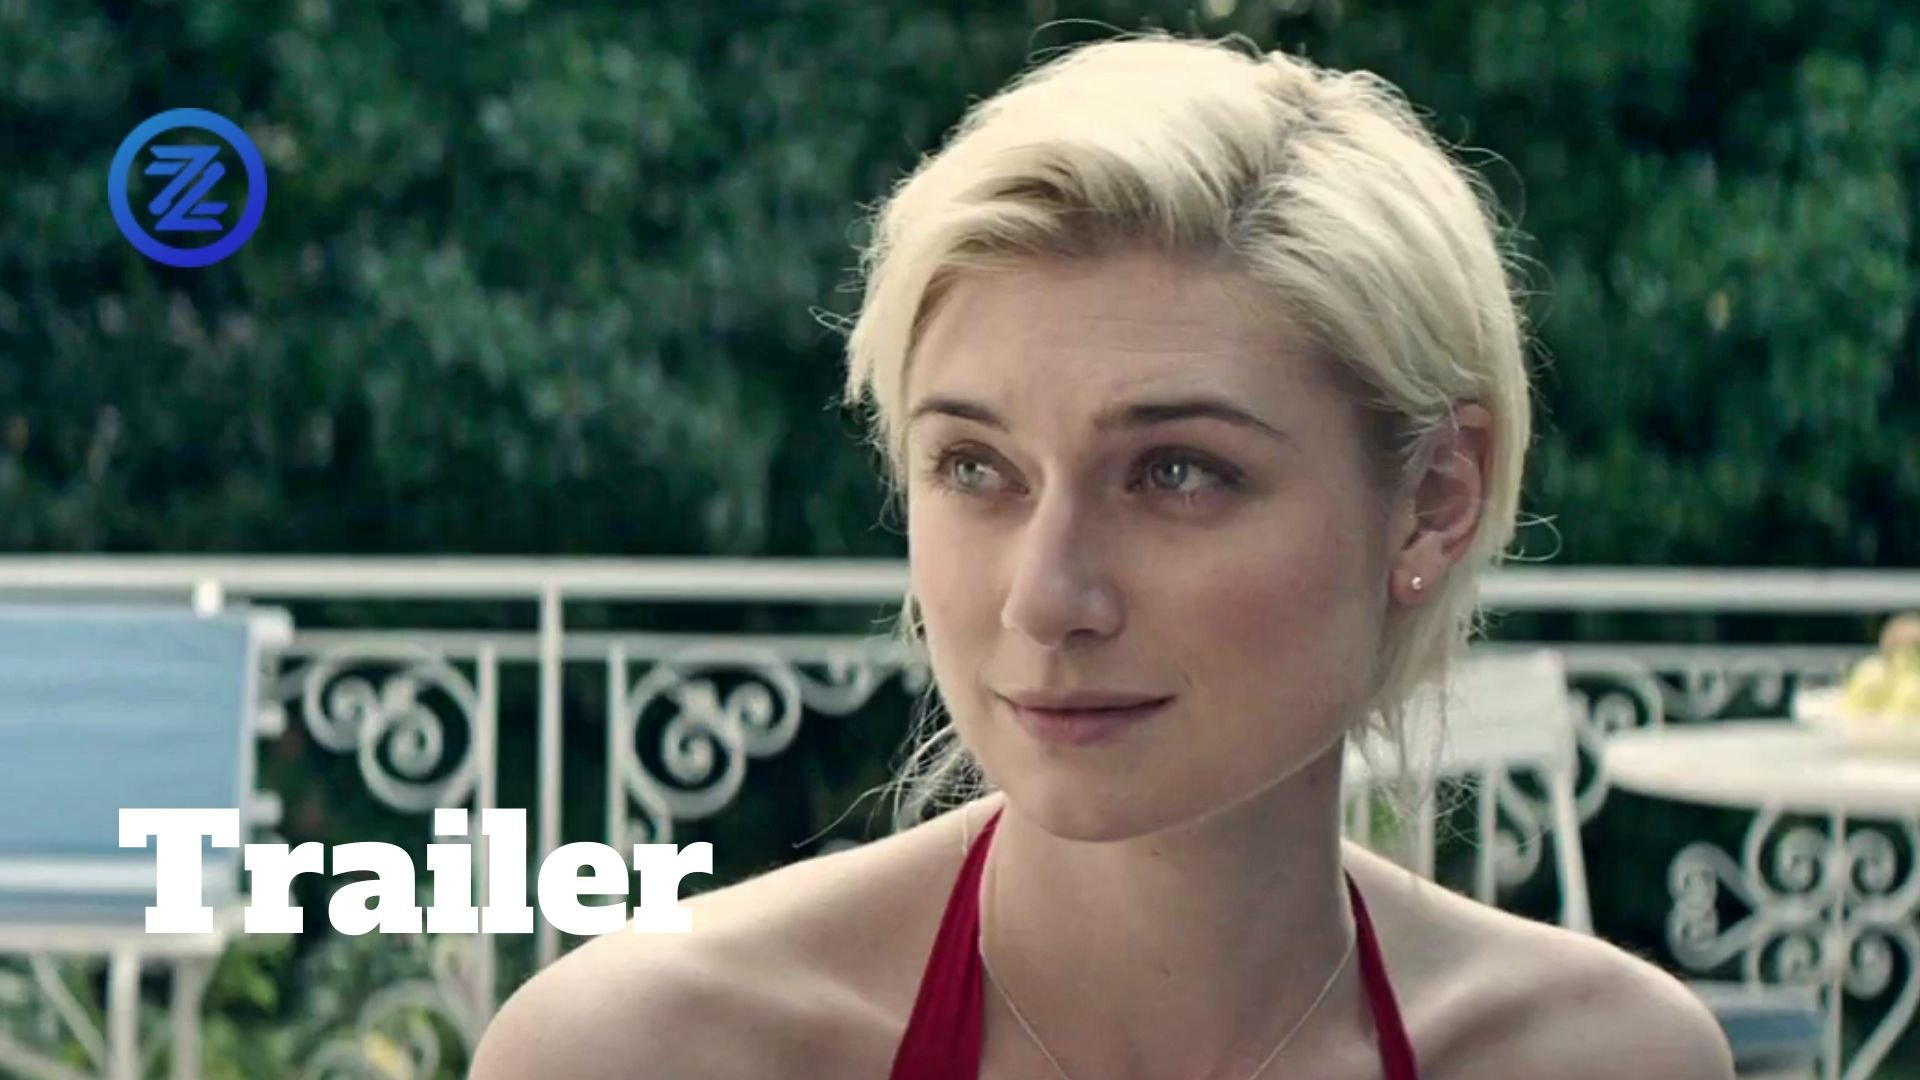 The Burnt Orange Heresy Trailer #1 (2020) Claes Bang, Elizabeth Debicki Action Movie HD